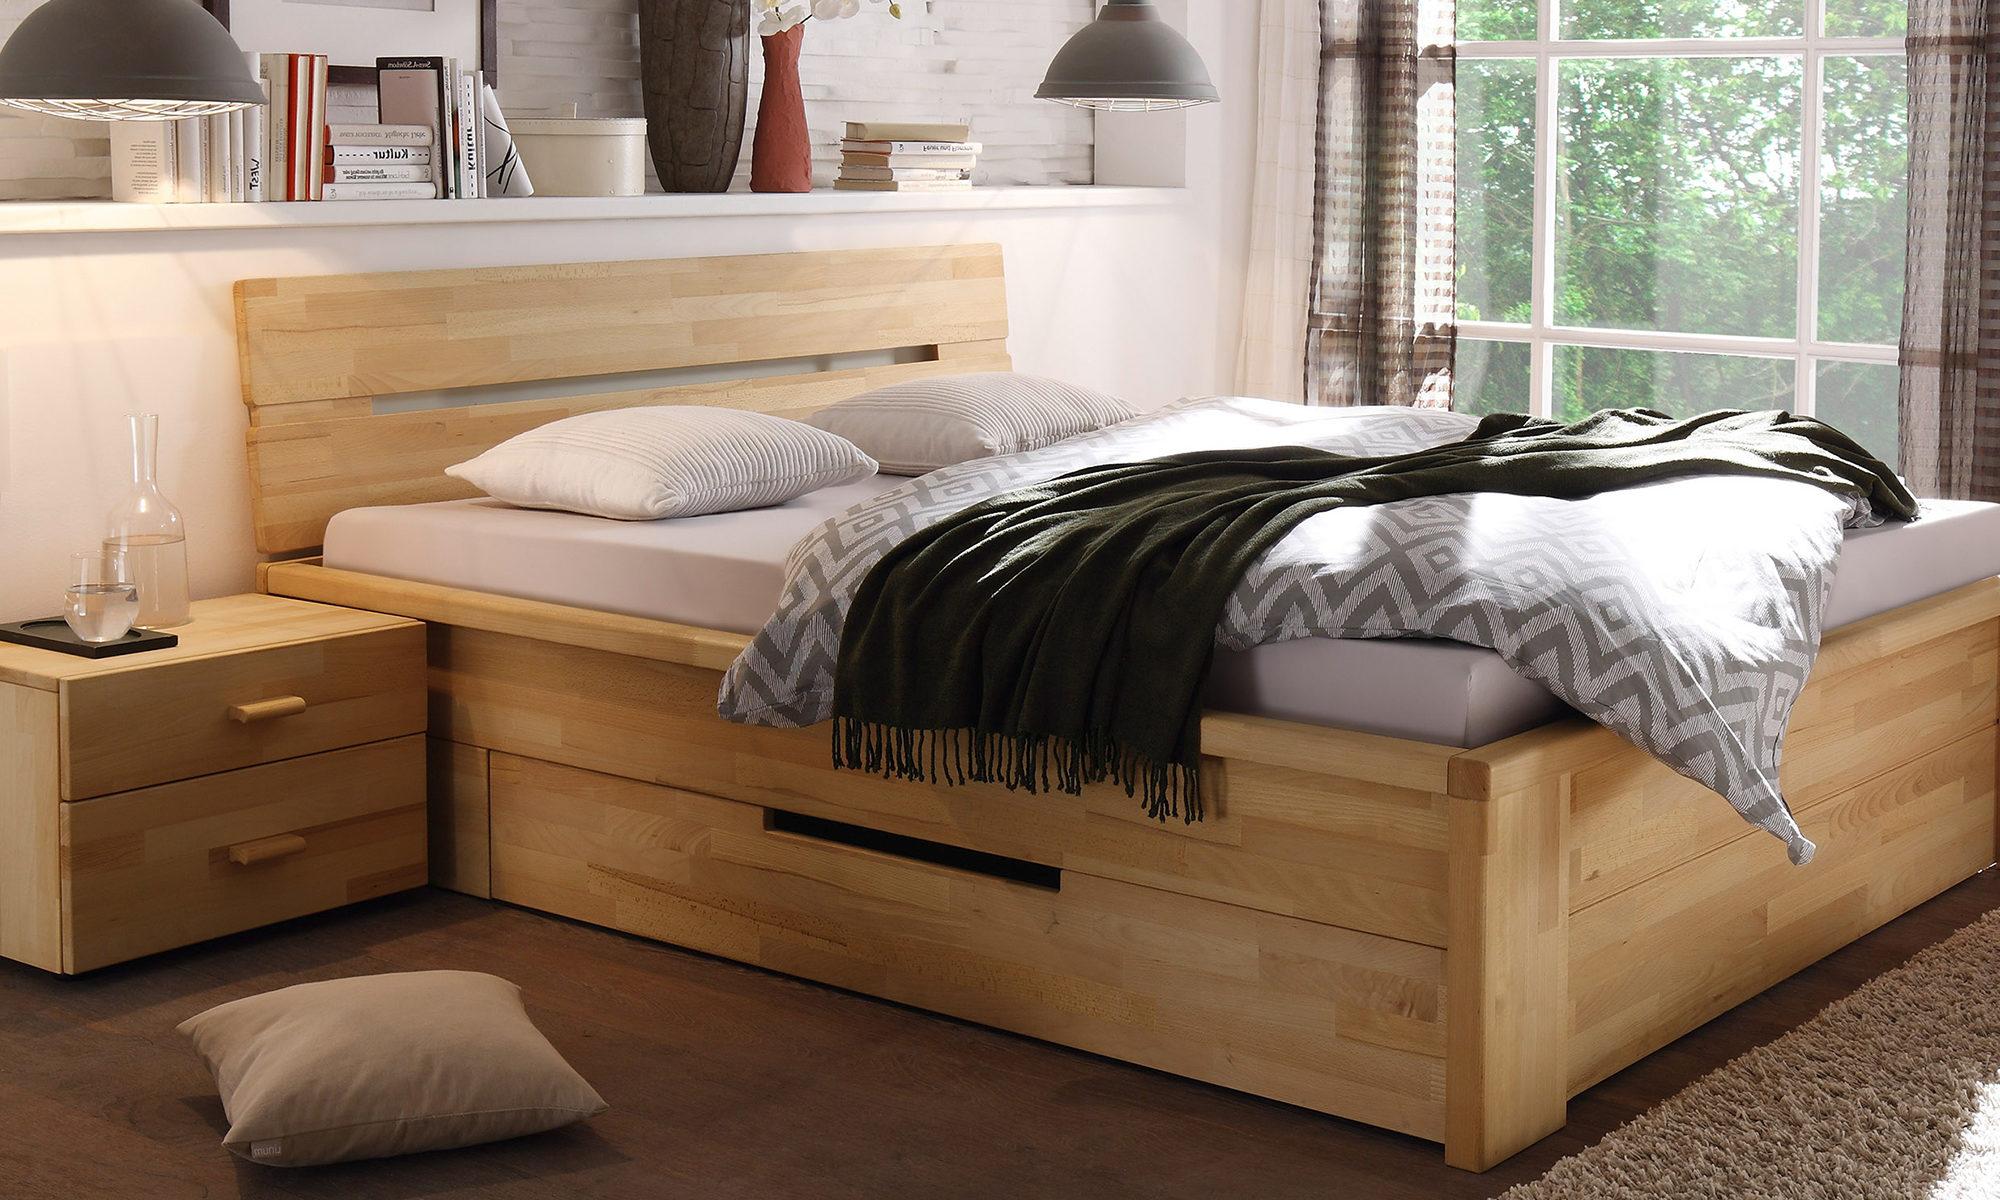 bett kaufen ikea bett kaufen schweiz ikea betten house. Black Bedroom Furniture Sets. Home Design Ideas